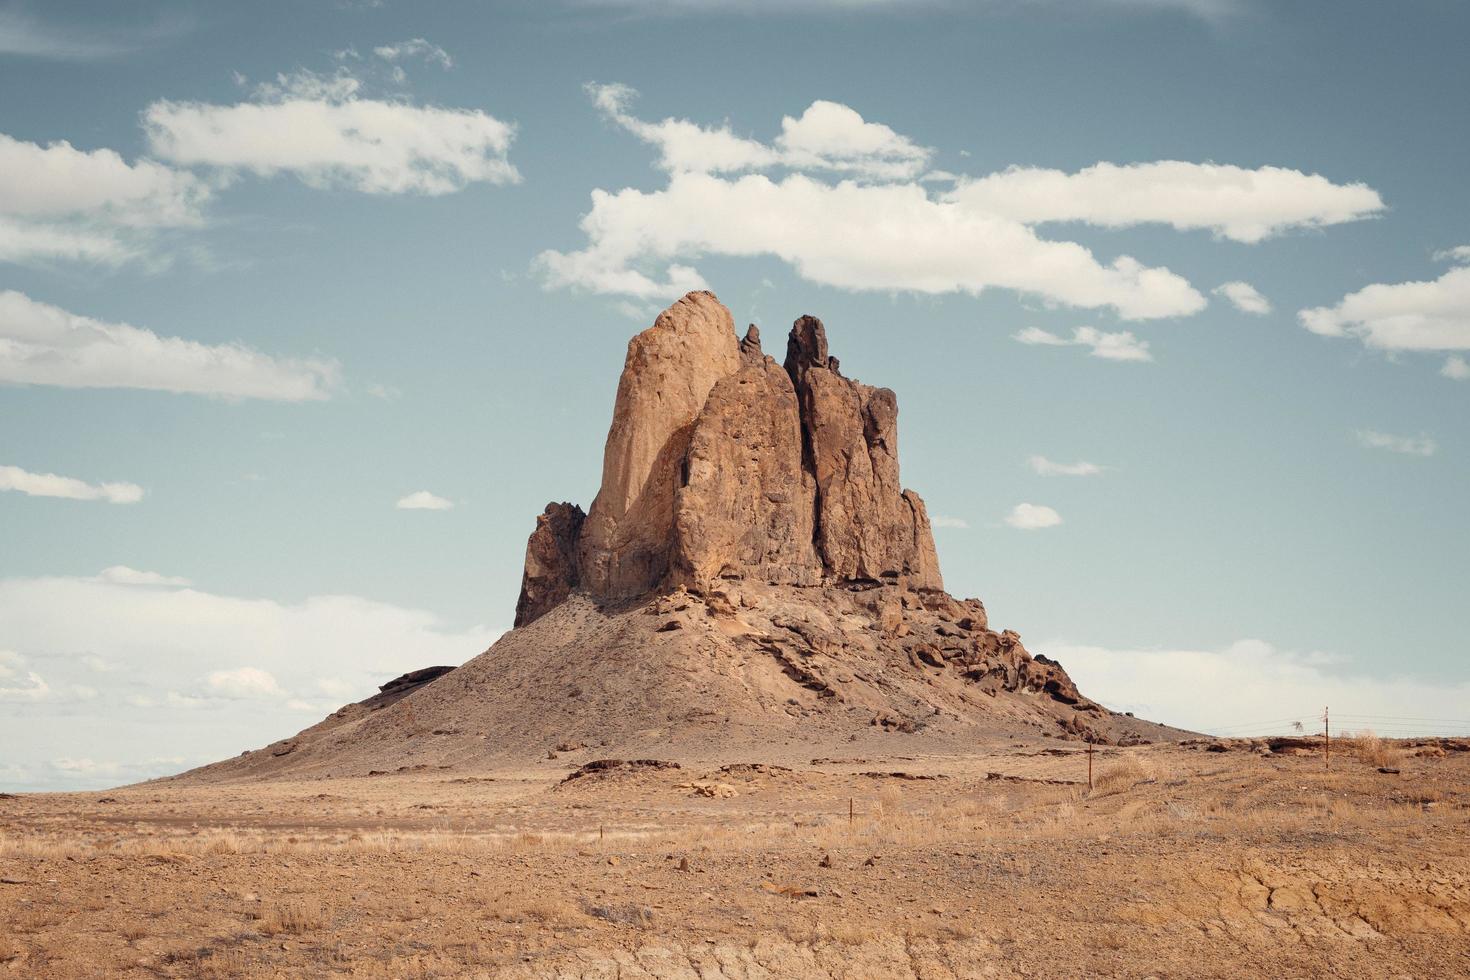 Rock formation in desert photo